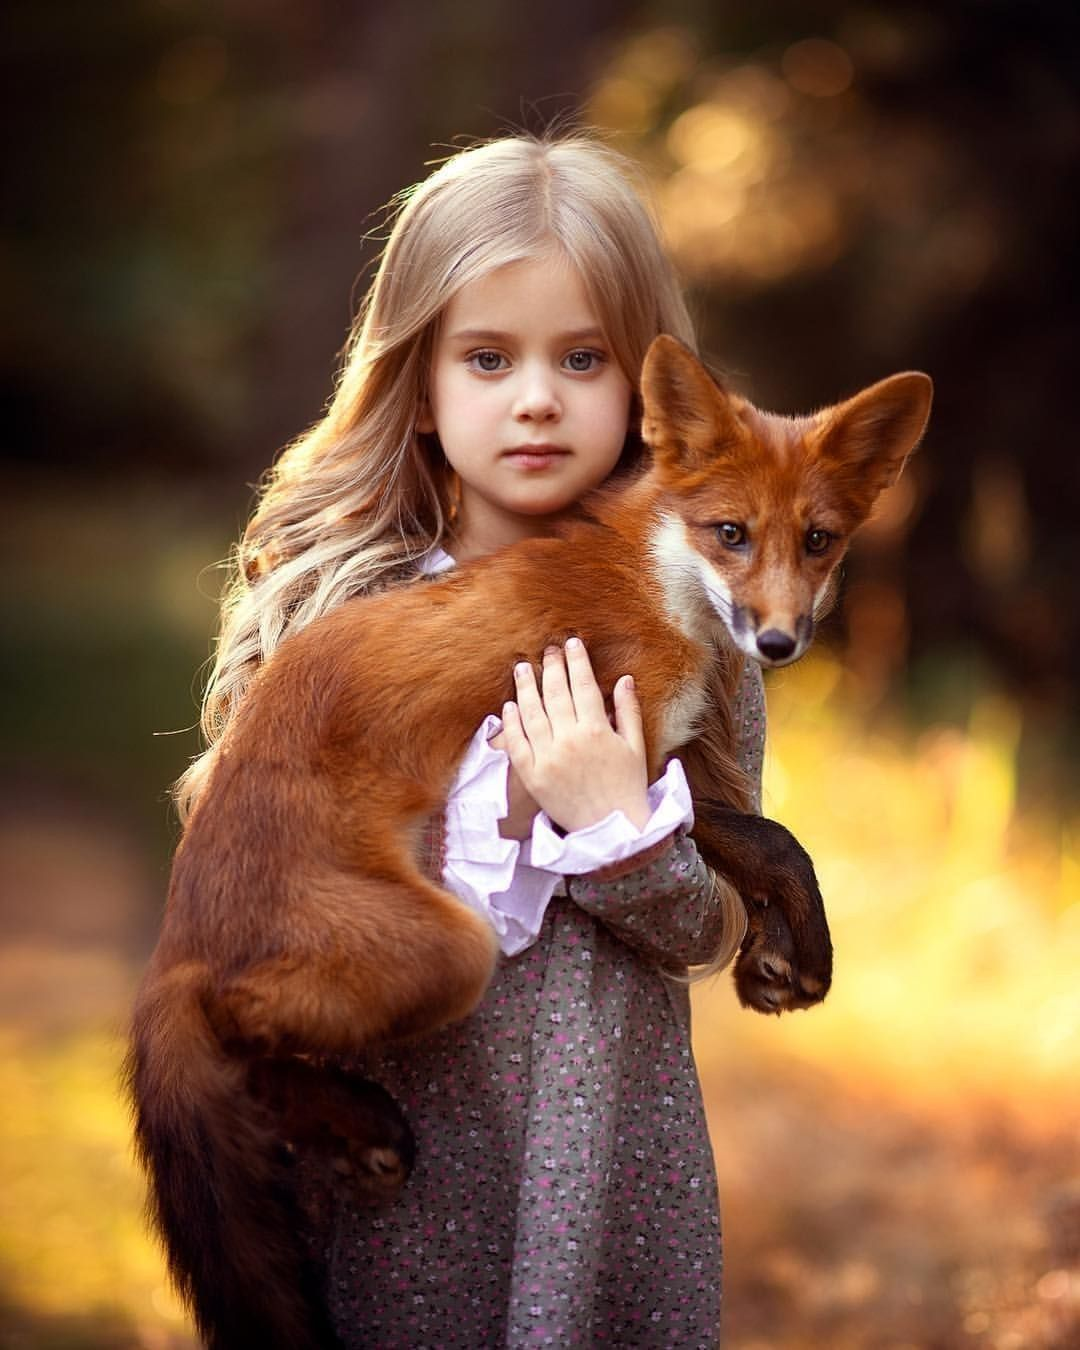 Top 20 Girls With Pet Fox Hintergrundbilder Pic Of Cute Babies Mit Schonen Tieren Top 10 Ranker B Animaux Mignons Animaux Pour Enfants Animaux Adorables